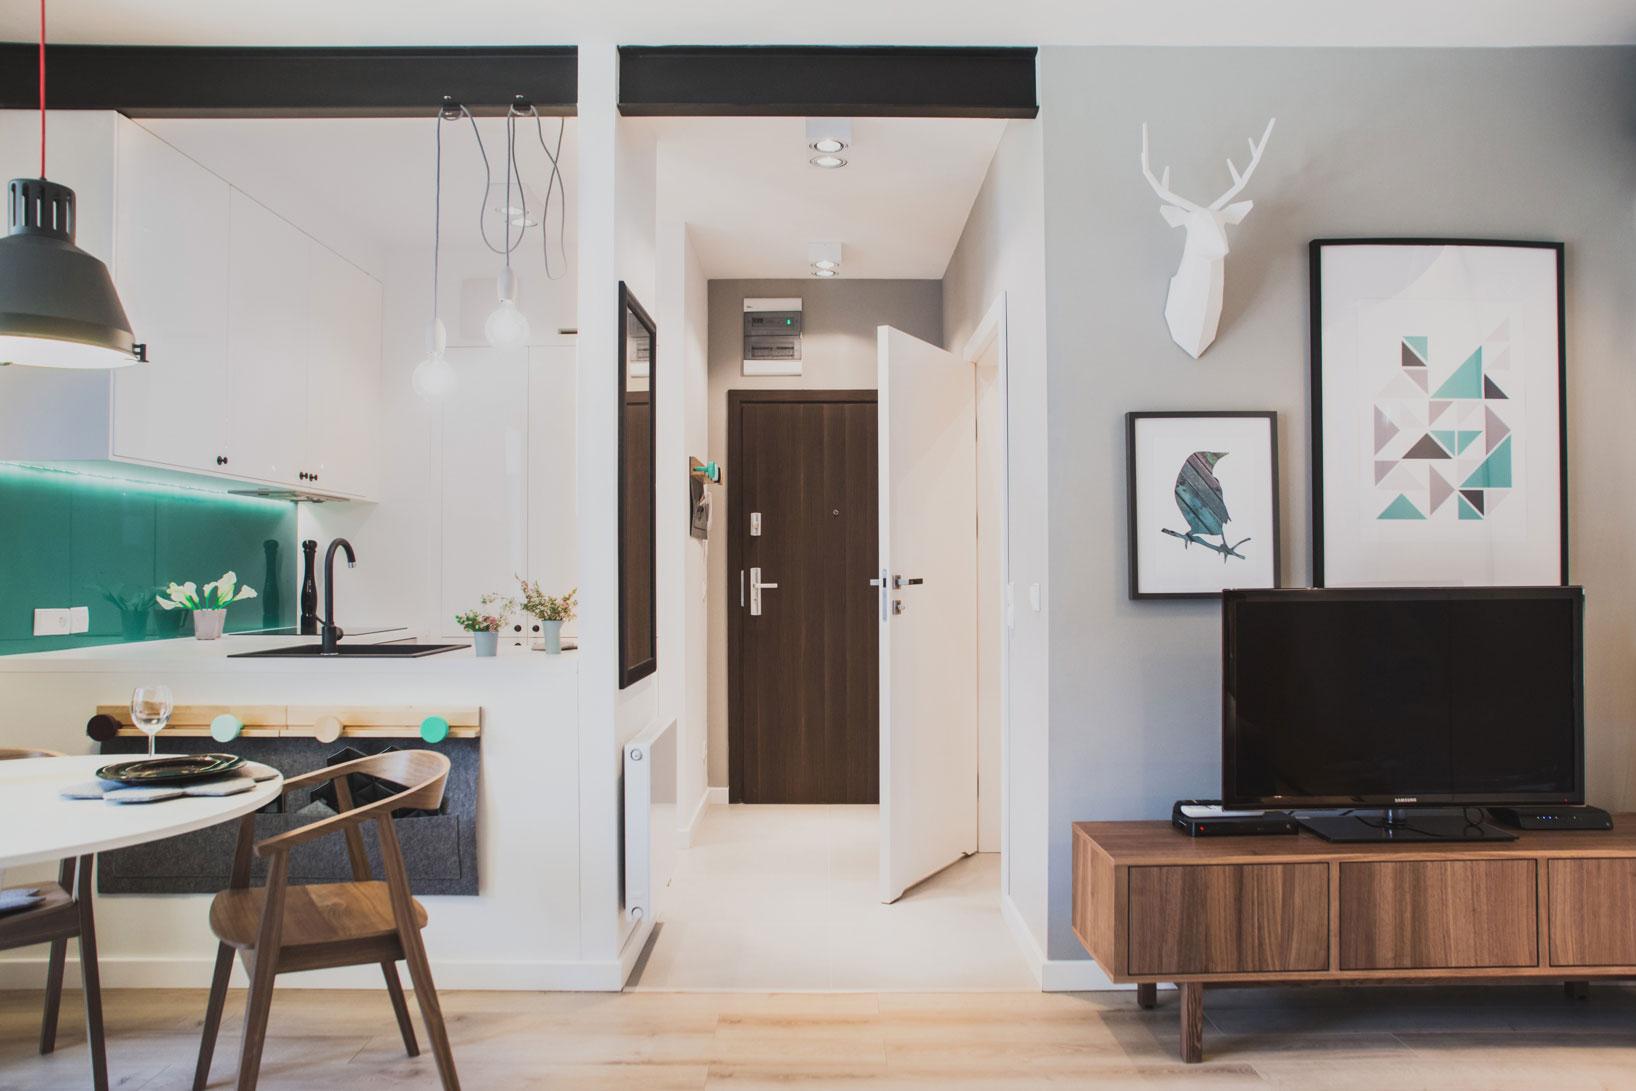 Szafarnia 2 Compact Apartment by Raca Architekci-03